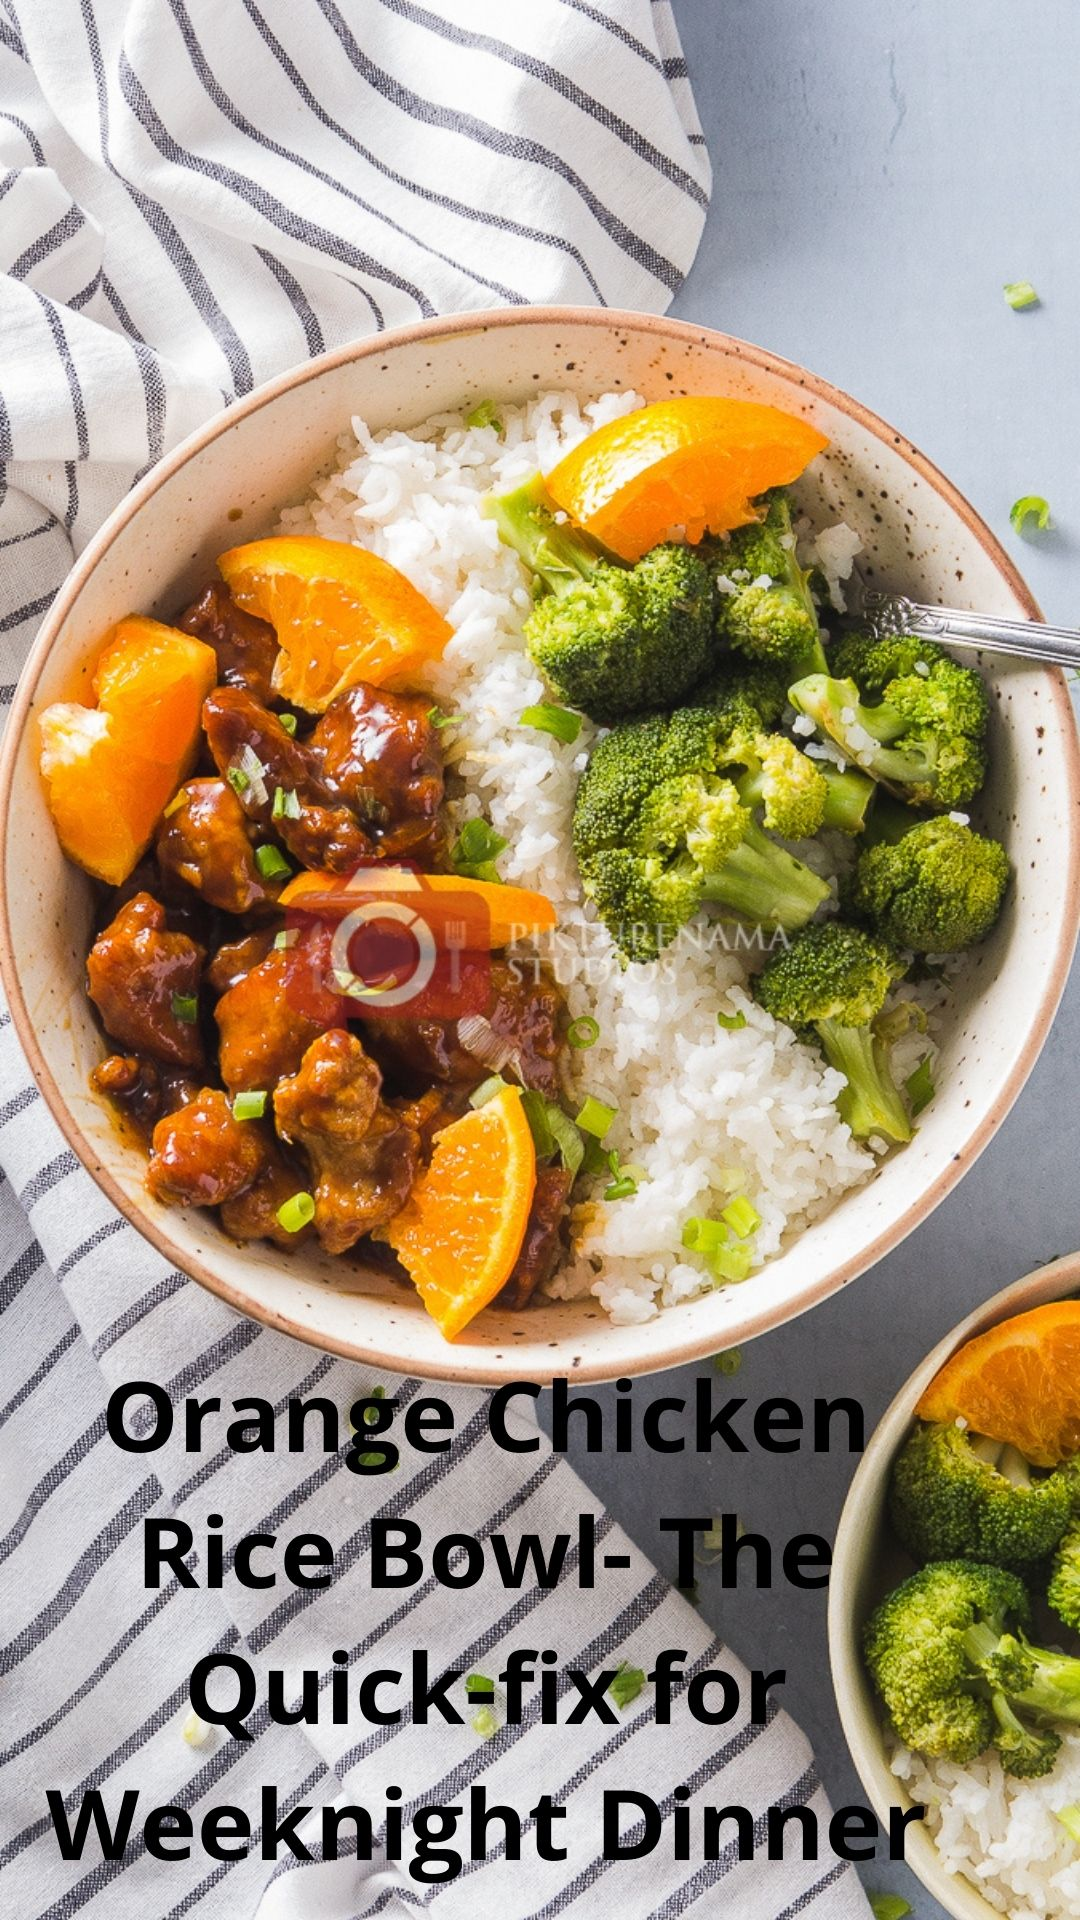 Orange Chicken Rice Bowl- The Quick-fix for Weeknight Dinner Pinterest